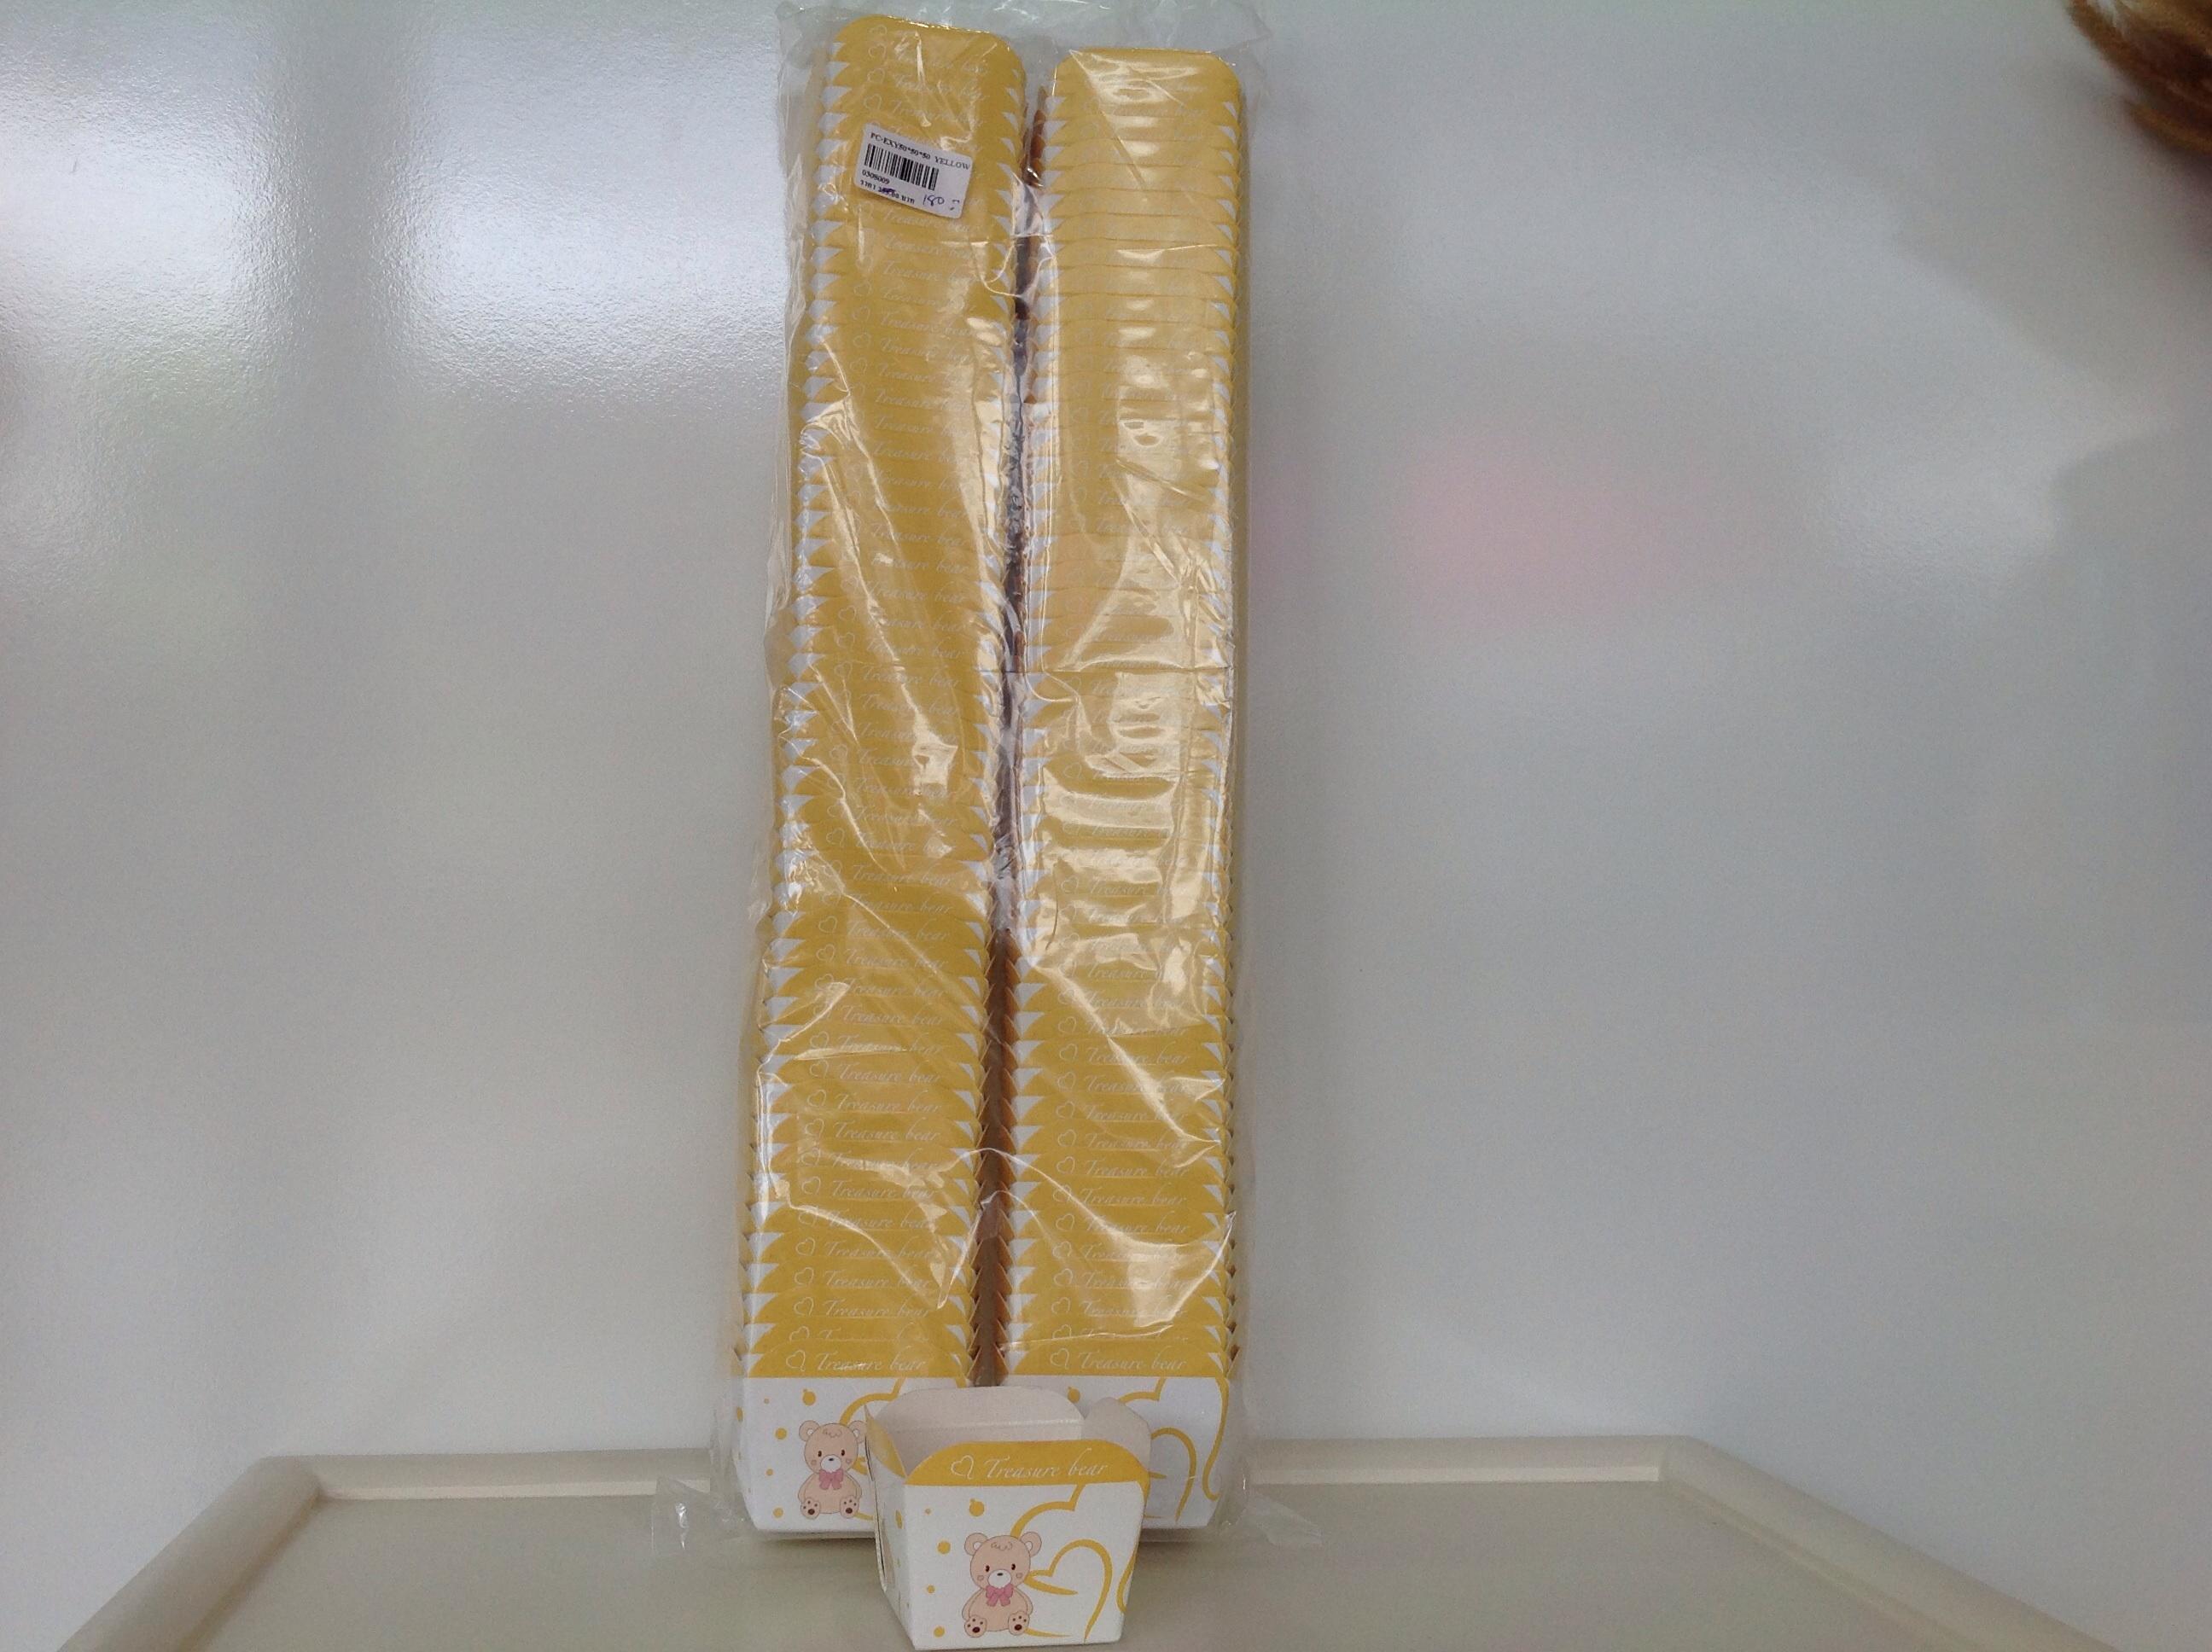 PC-EXY50x50x50 Yellow Bear